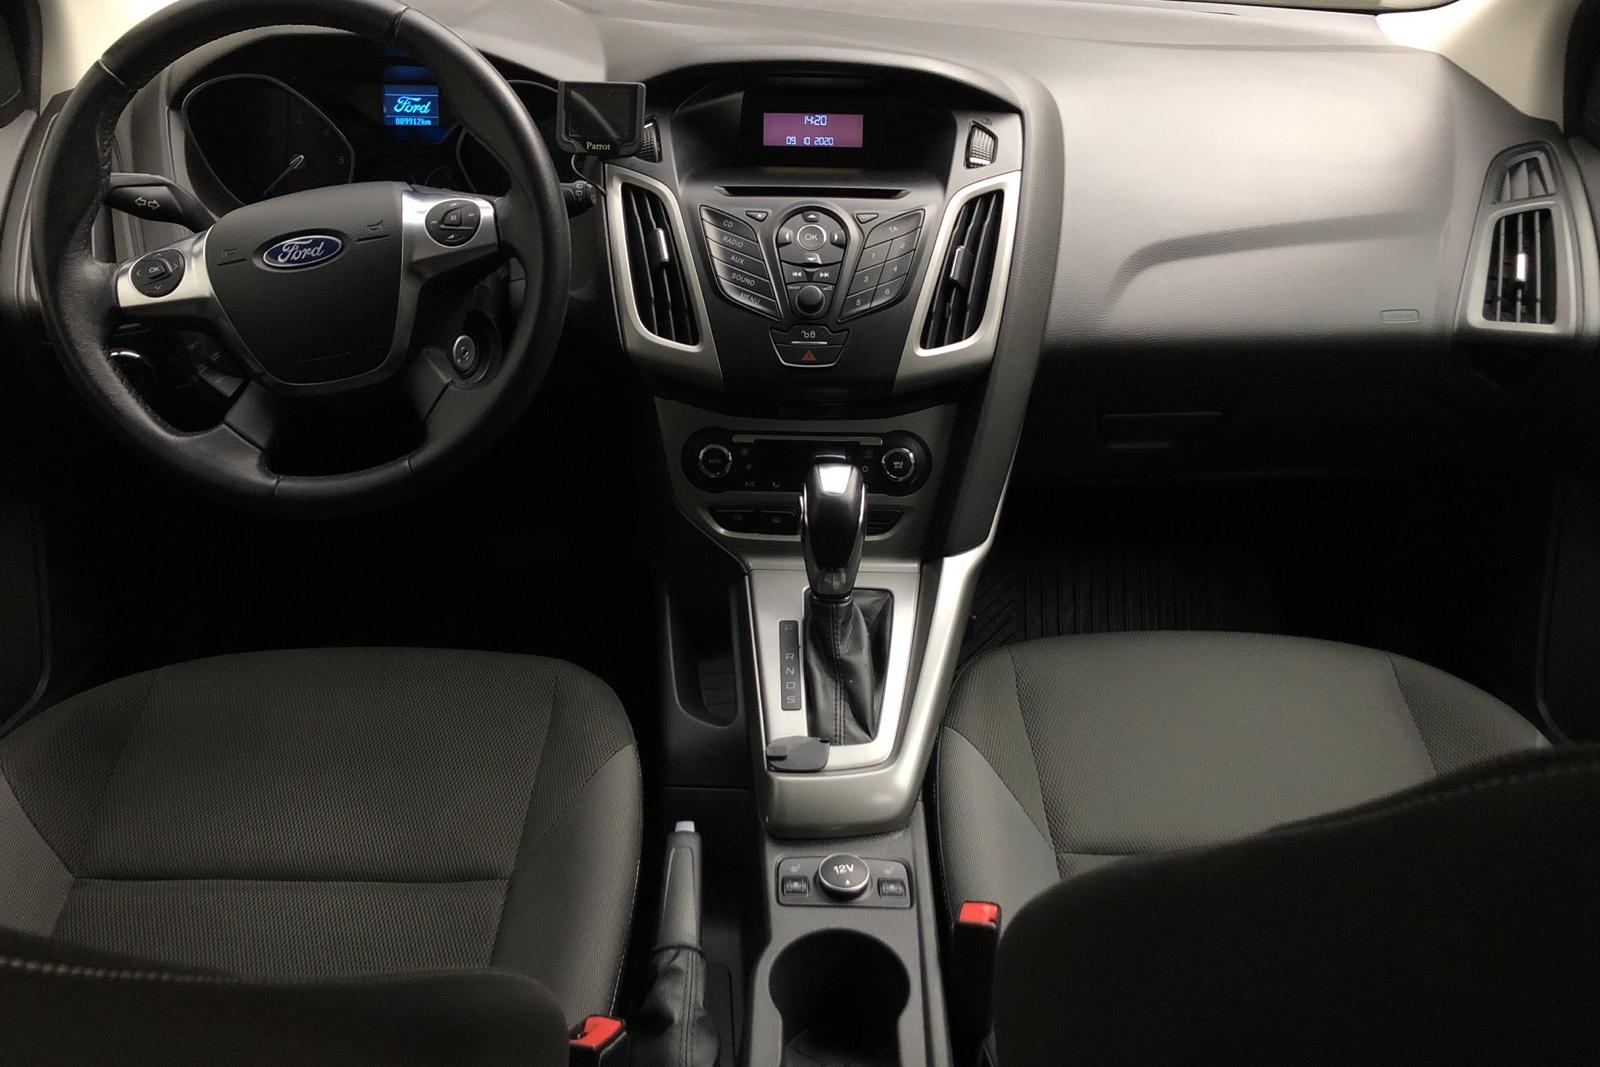 Ford Focus 2.0 TDCi Kombi (115hk) - 0 km - Automatic - gray - 2012